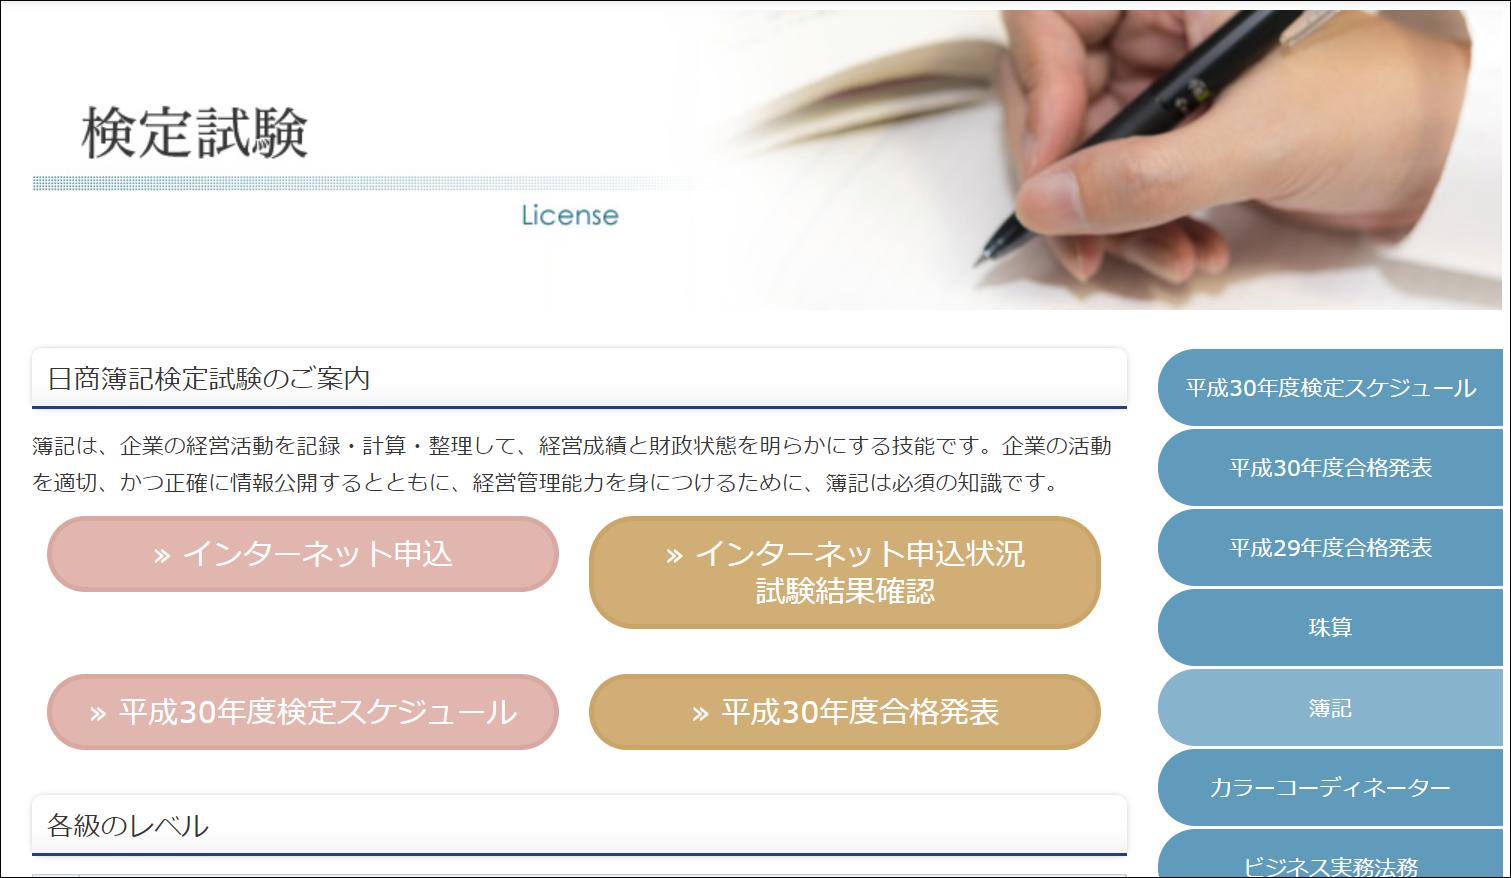 簿記検定試験のHP